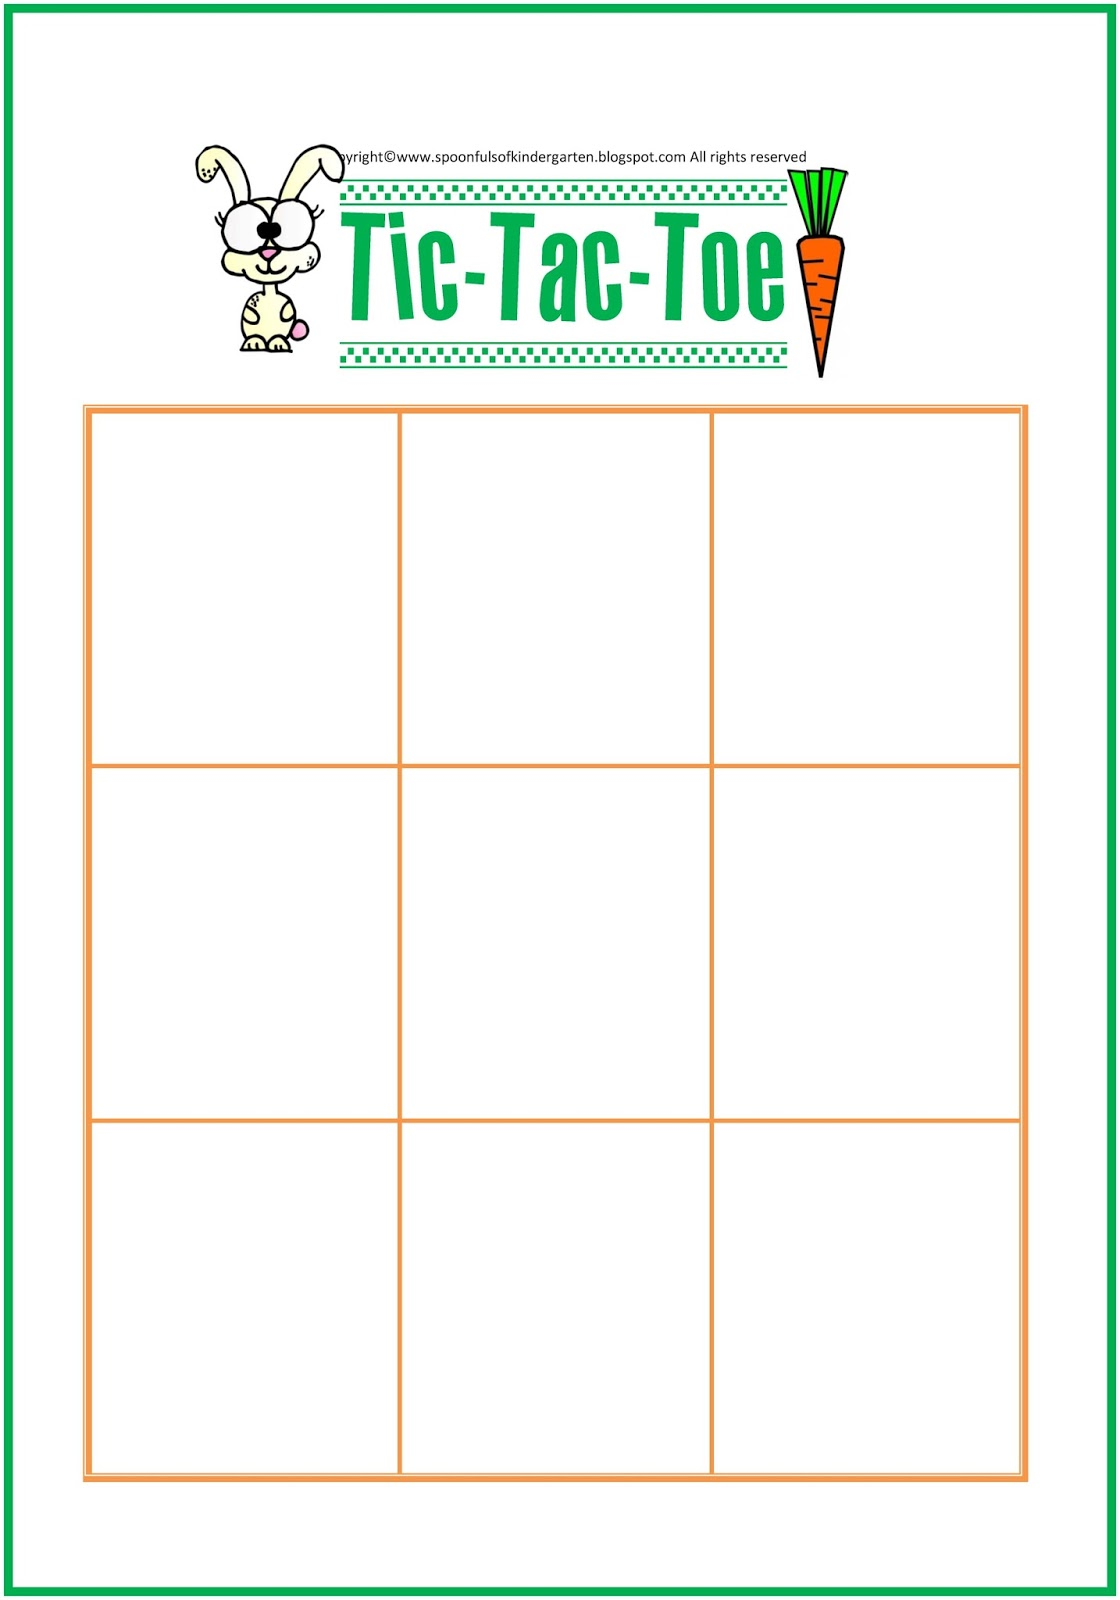 Spoonfuls Of Kindergarten Tic Tac Toe Game Board For